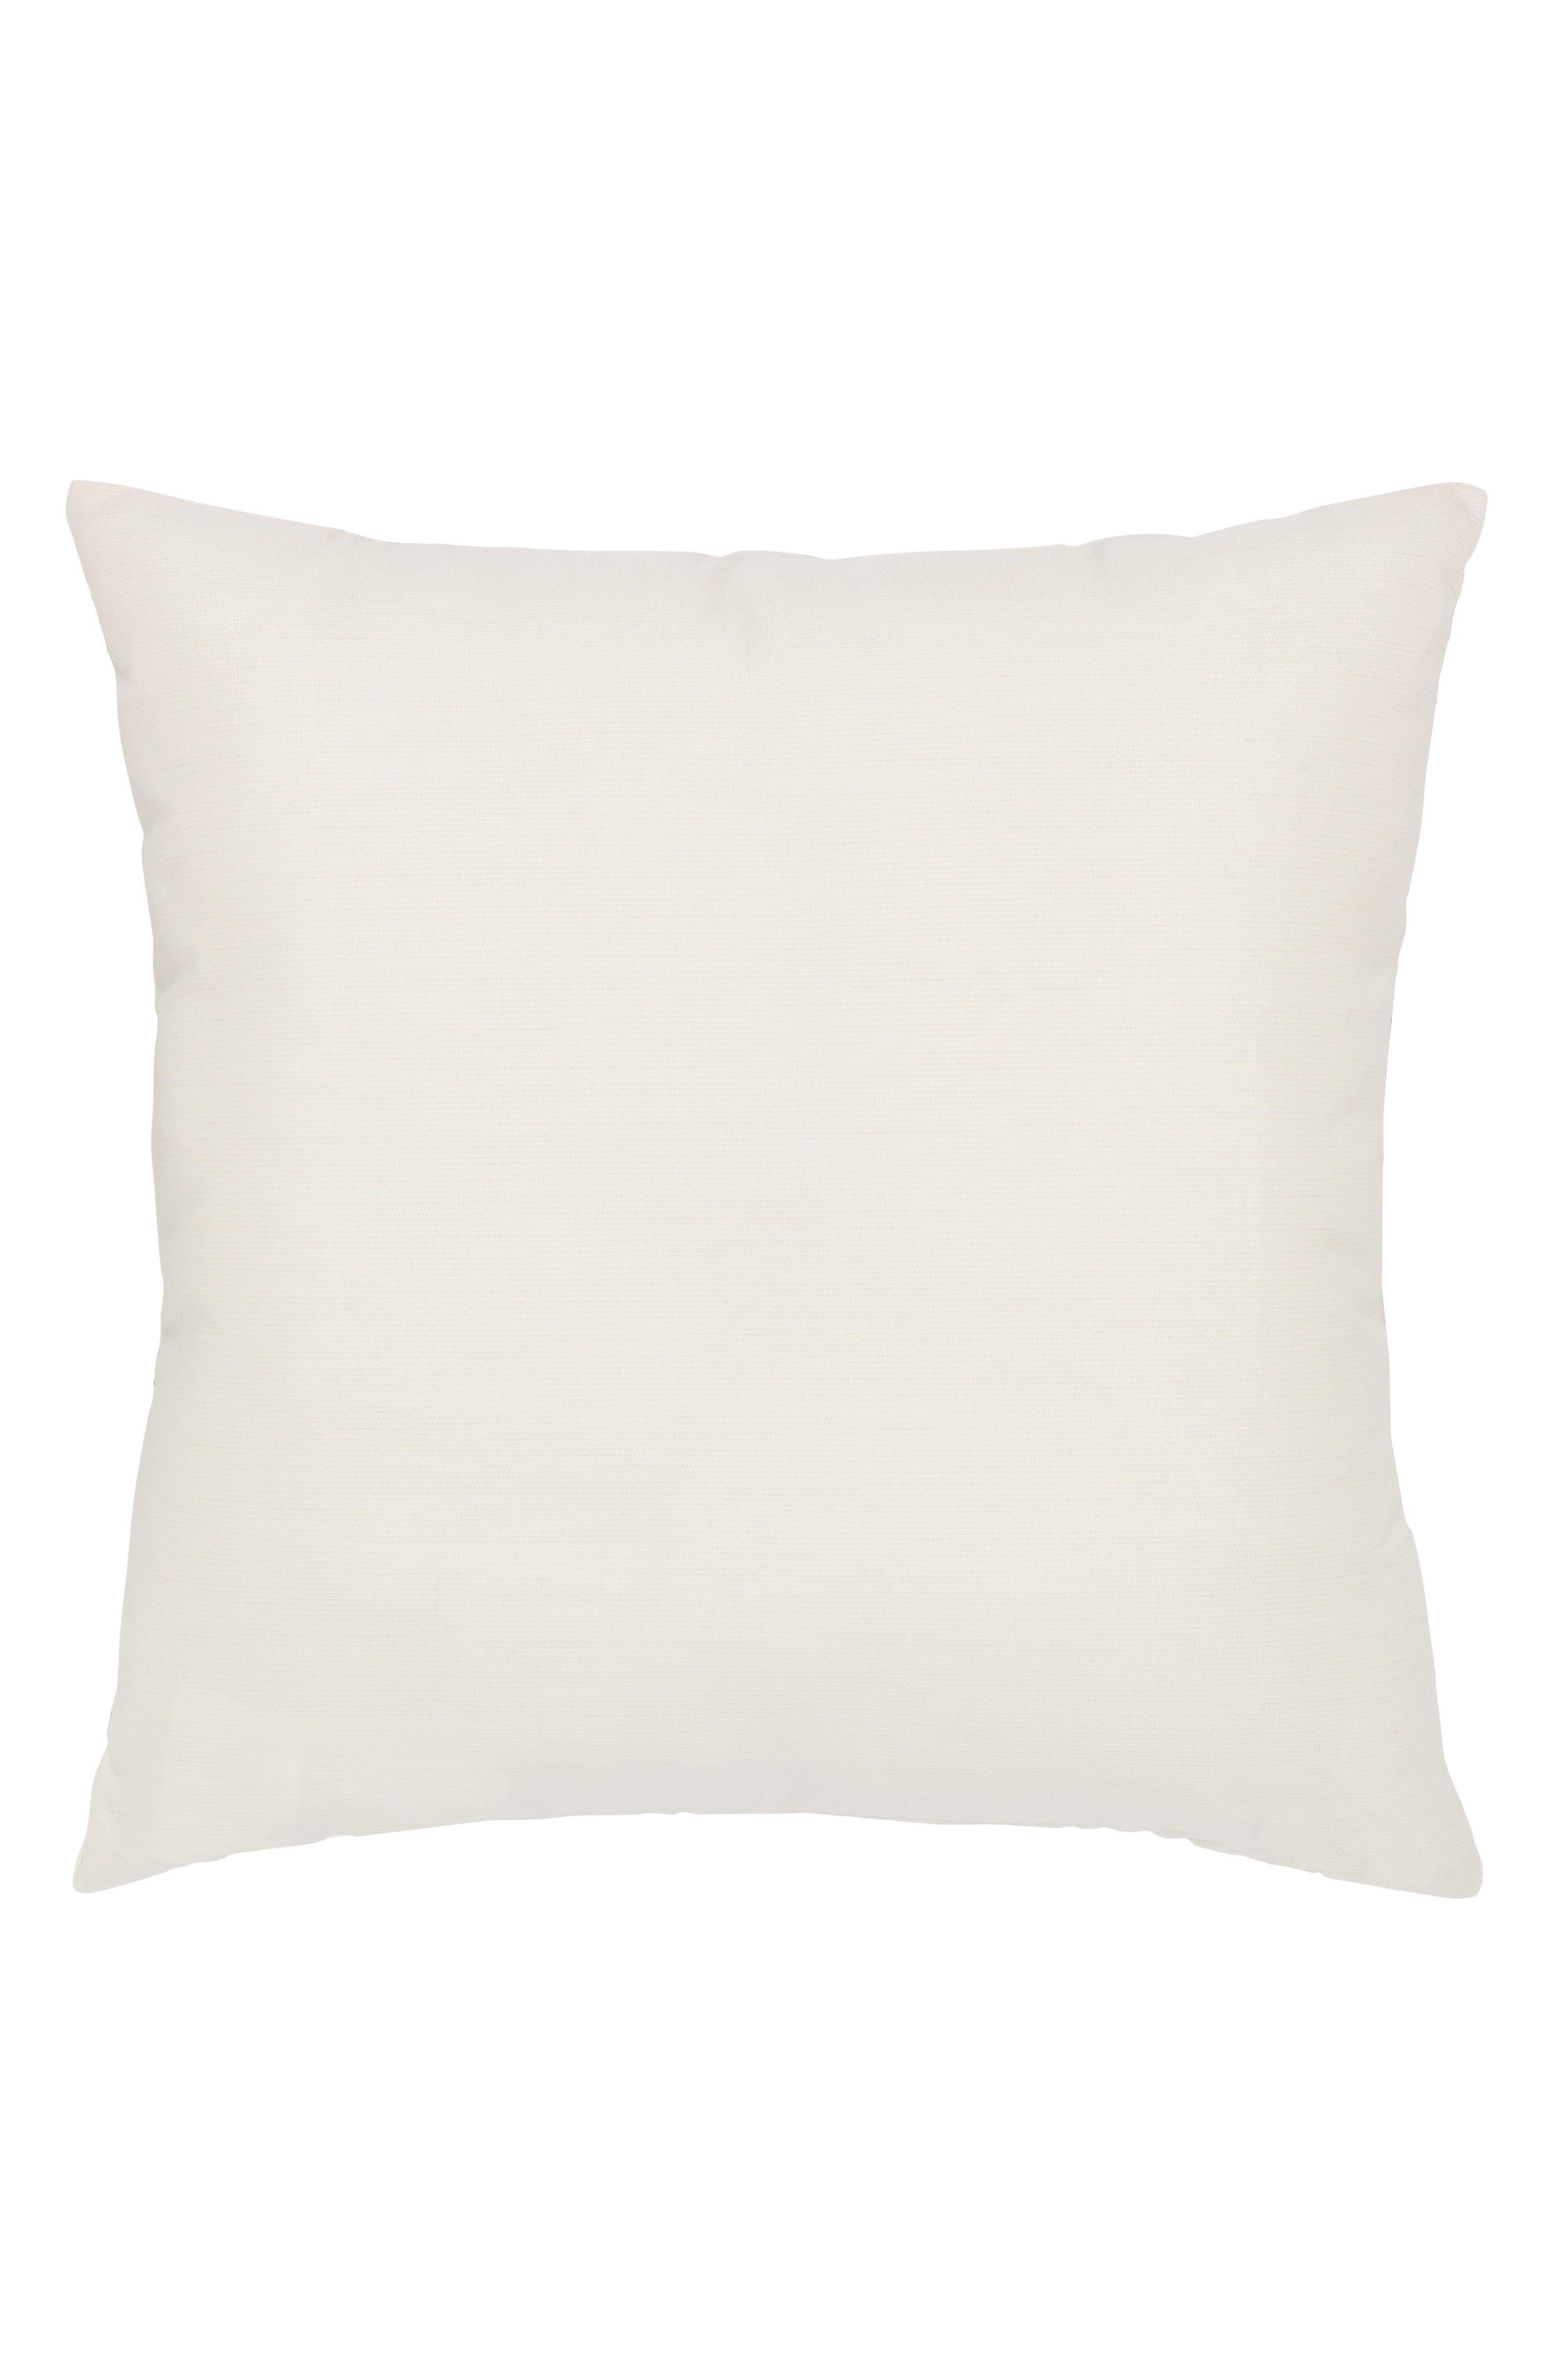 Metallic Block Indoor/Outdoor Accent Pillow,                             Alternate thumbnail 2, color,                             710